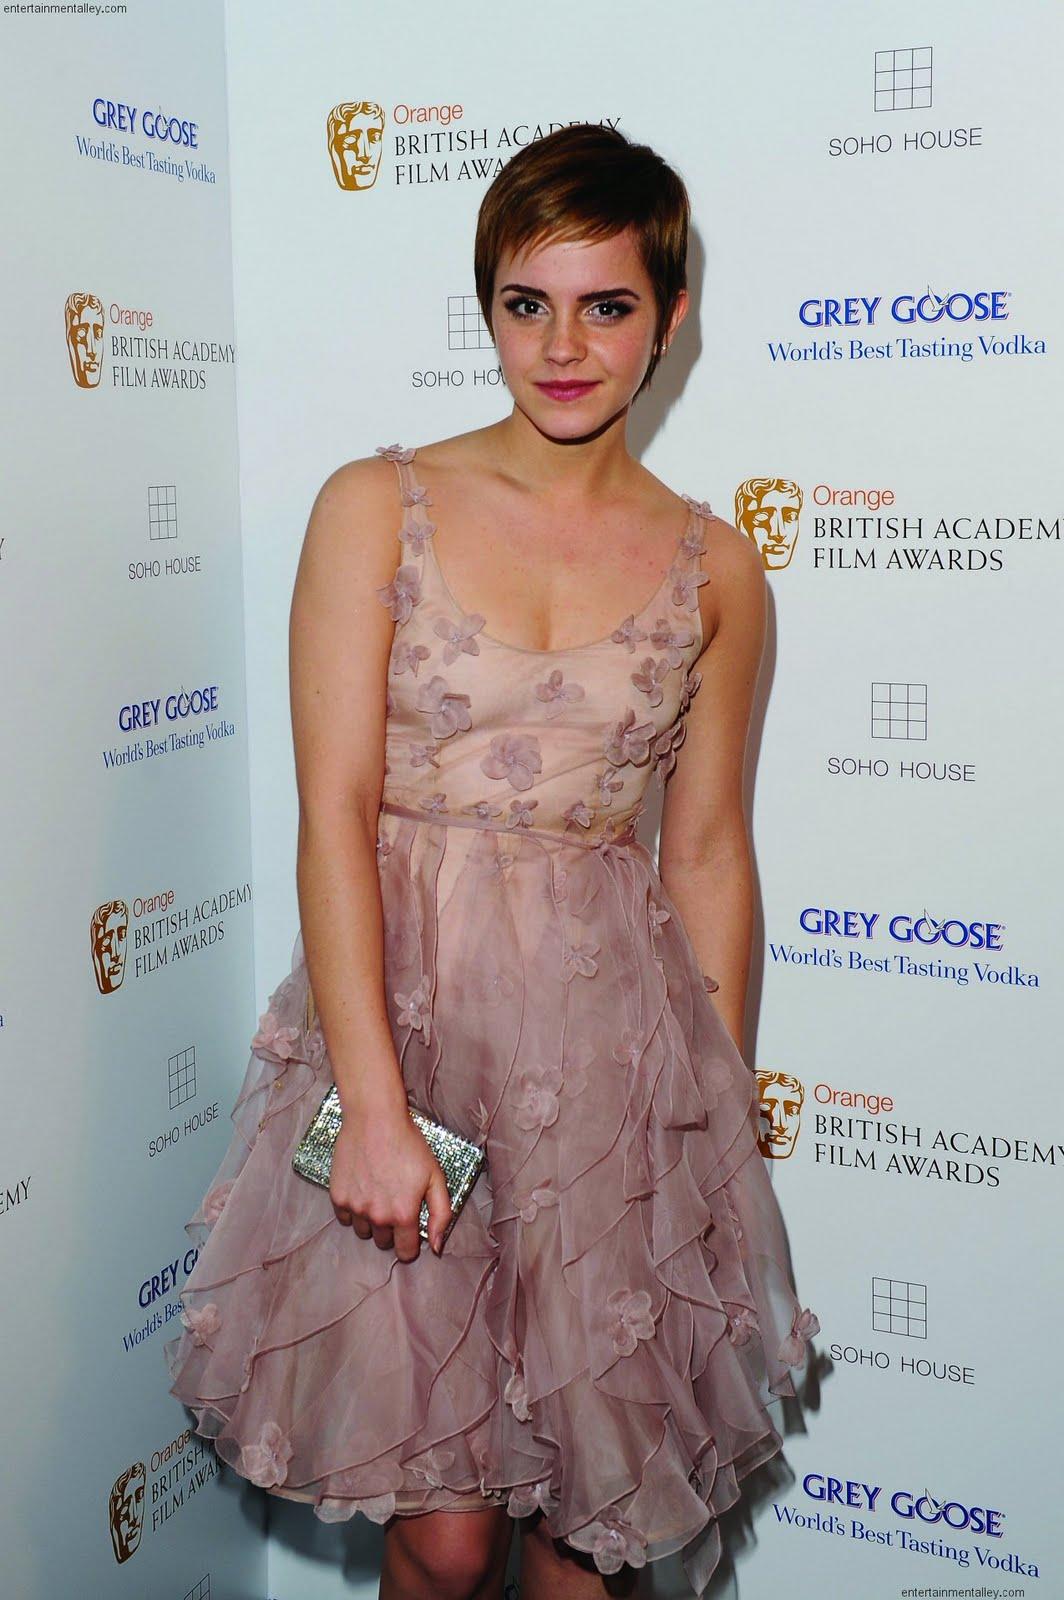 http://1.bp.blogspot.com/-MY2IOuLFZ6c/Td2bdRR_tVI/AAAAAAAAAHs/8jsQEV9-fSg/s1600/BAFTA-SohoHouseAfterParty-EmmaWatson-2.jpg